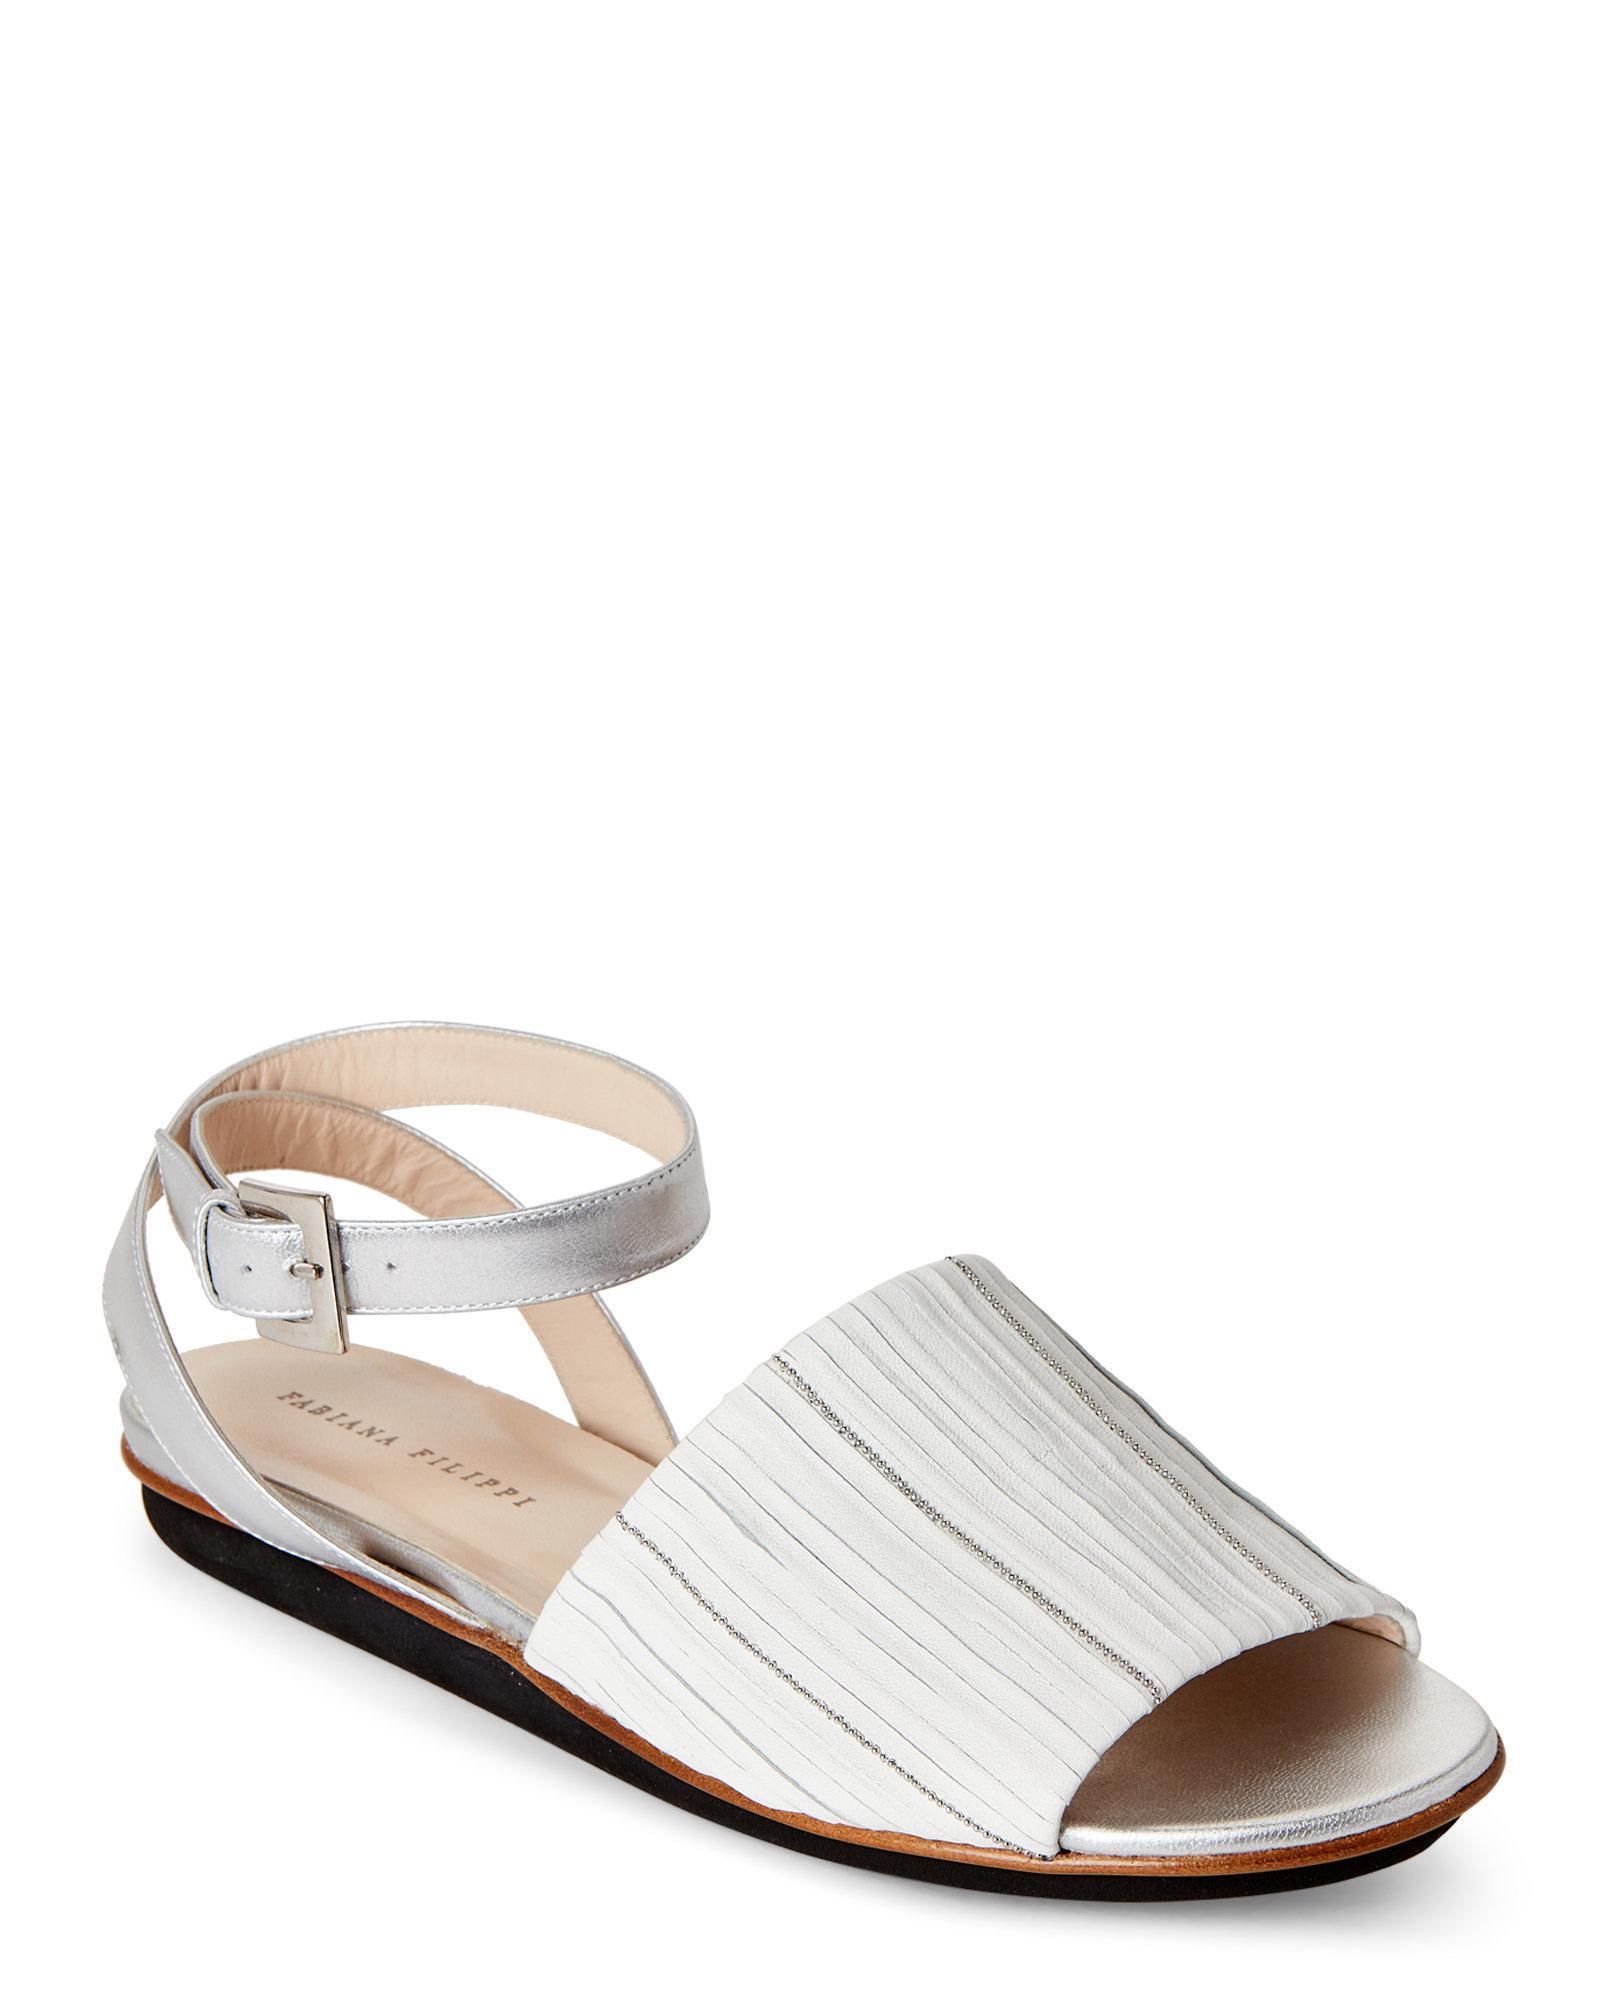 Fabiana Filippi Embellished ankle strap sandals rGv4fXojO2